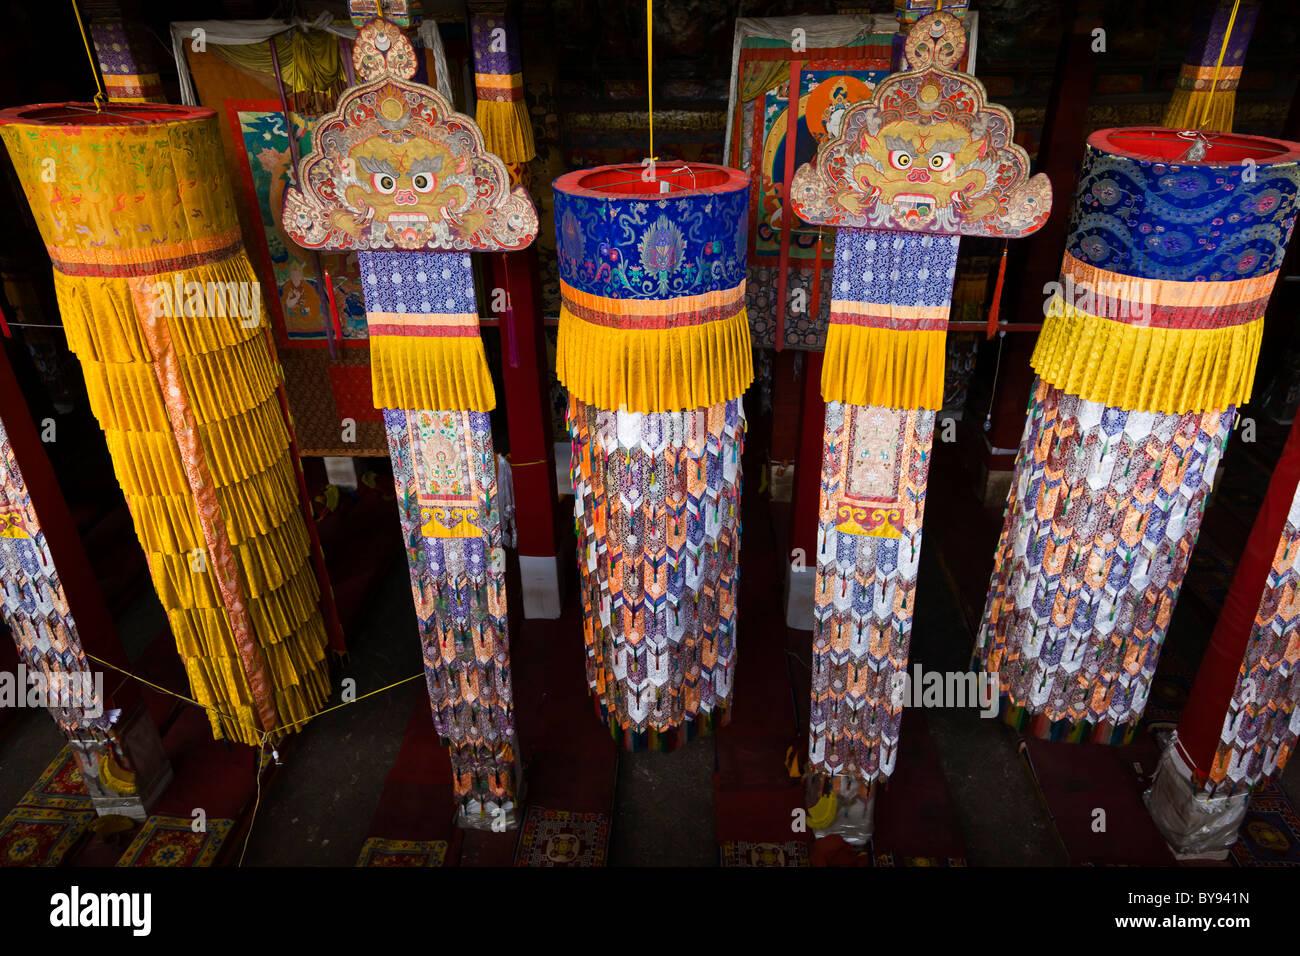 Hanging decorations in the Prayer Hall at Drepung Monastery, Lhasa, Tibet. JMH4548 - Stock Image